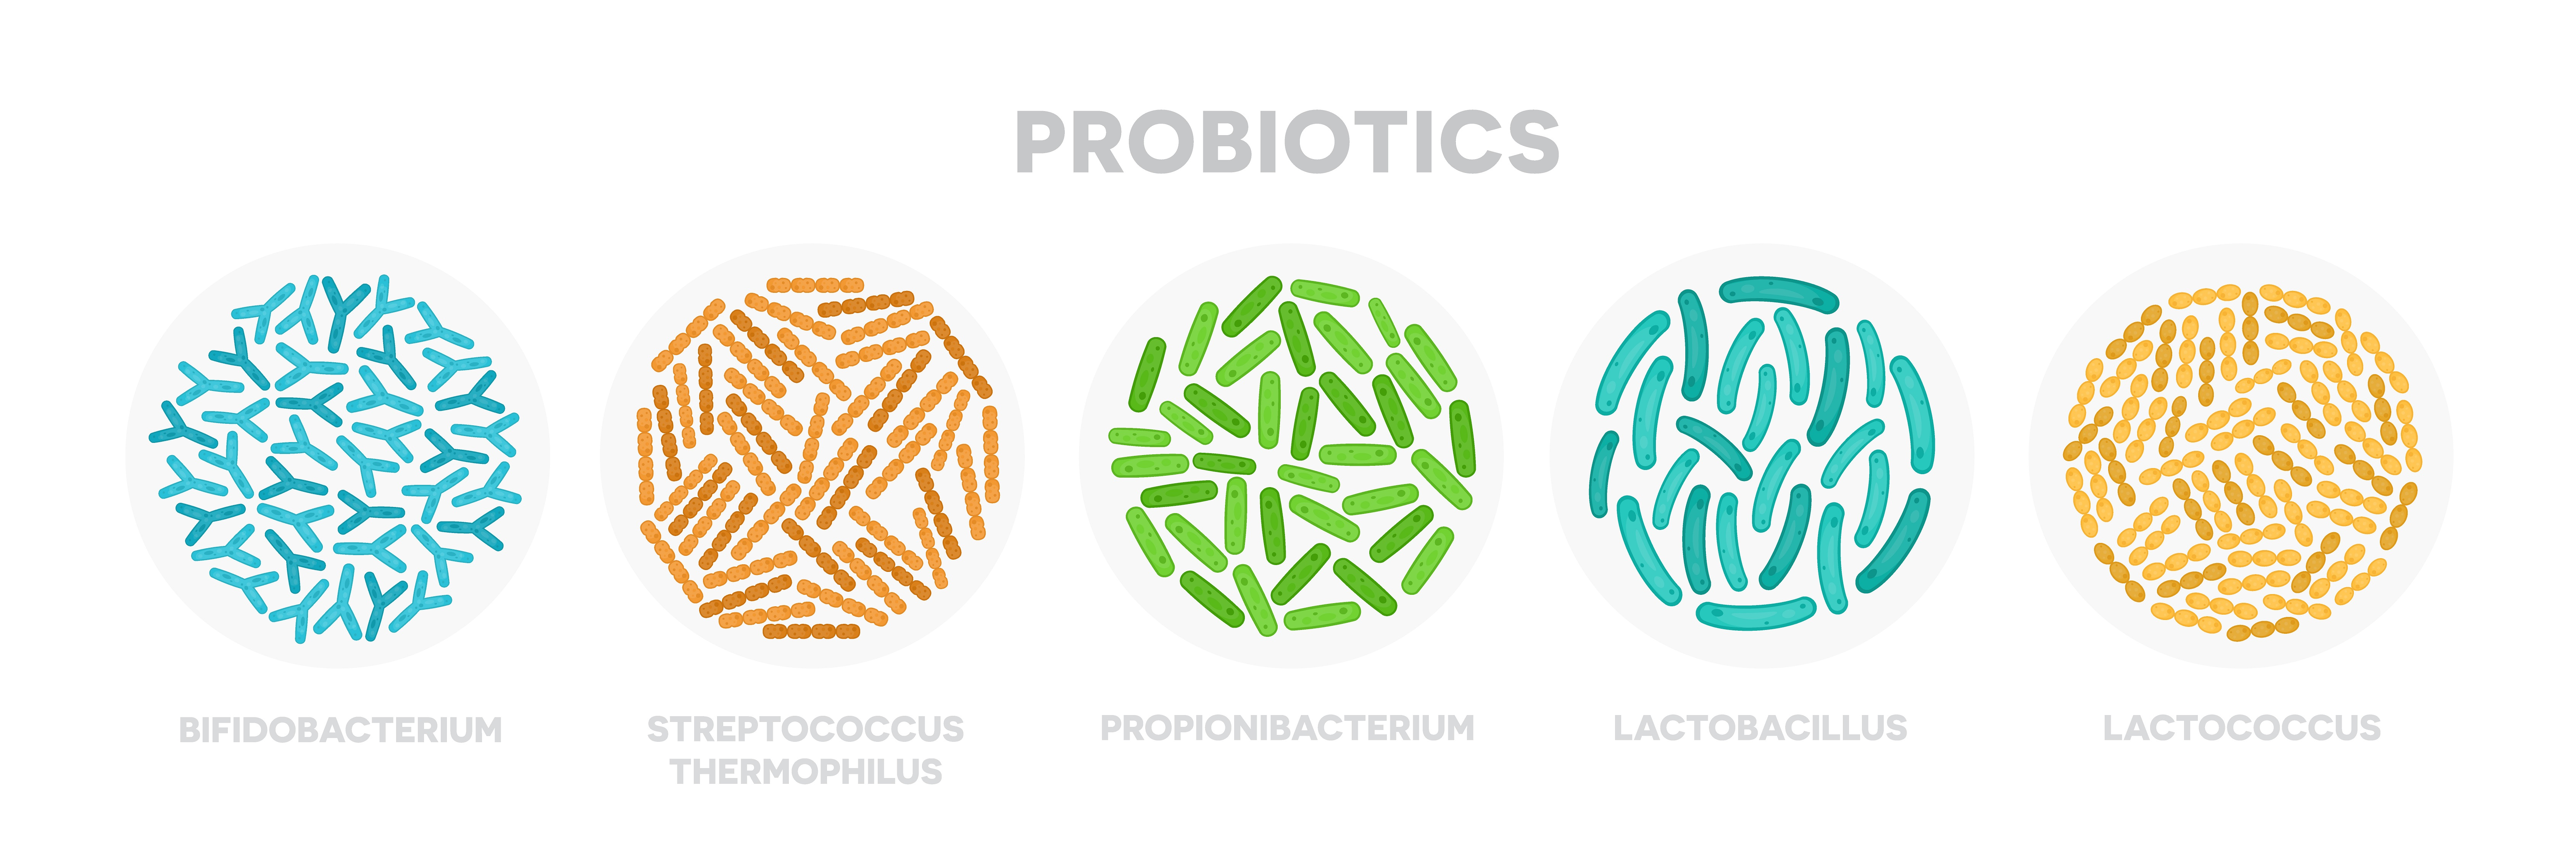 The most popular species of probiotics